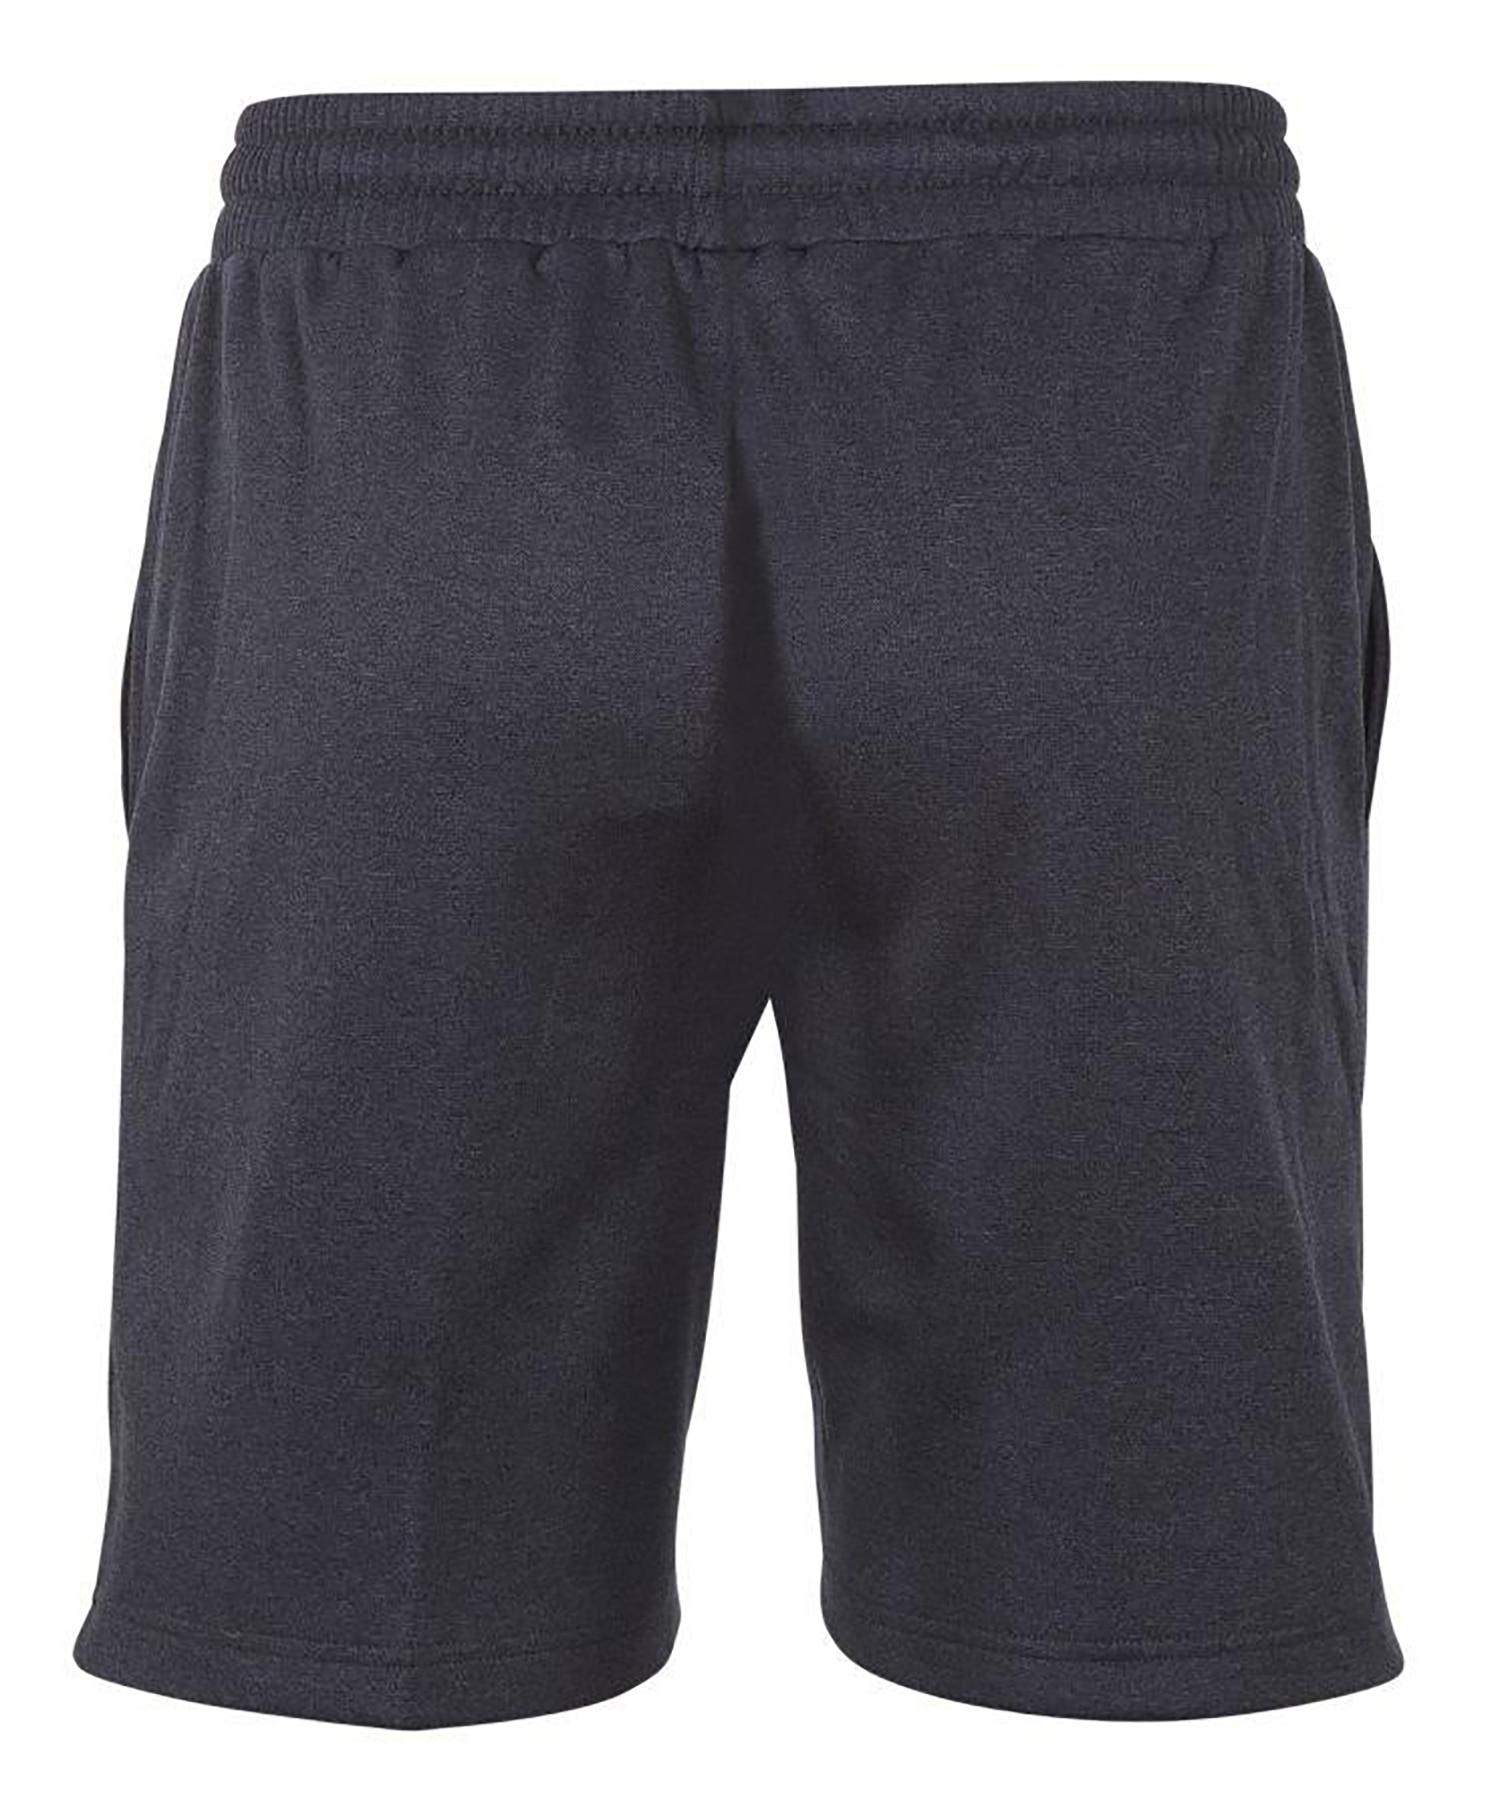 Umbro Core Tech Shorts